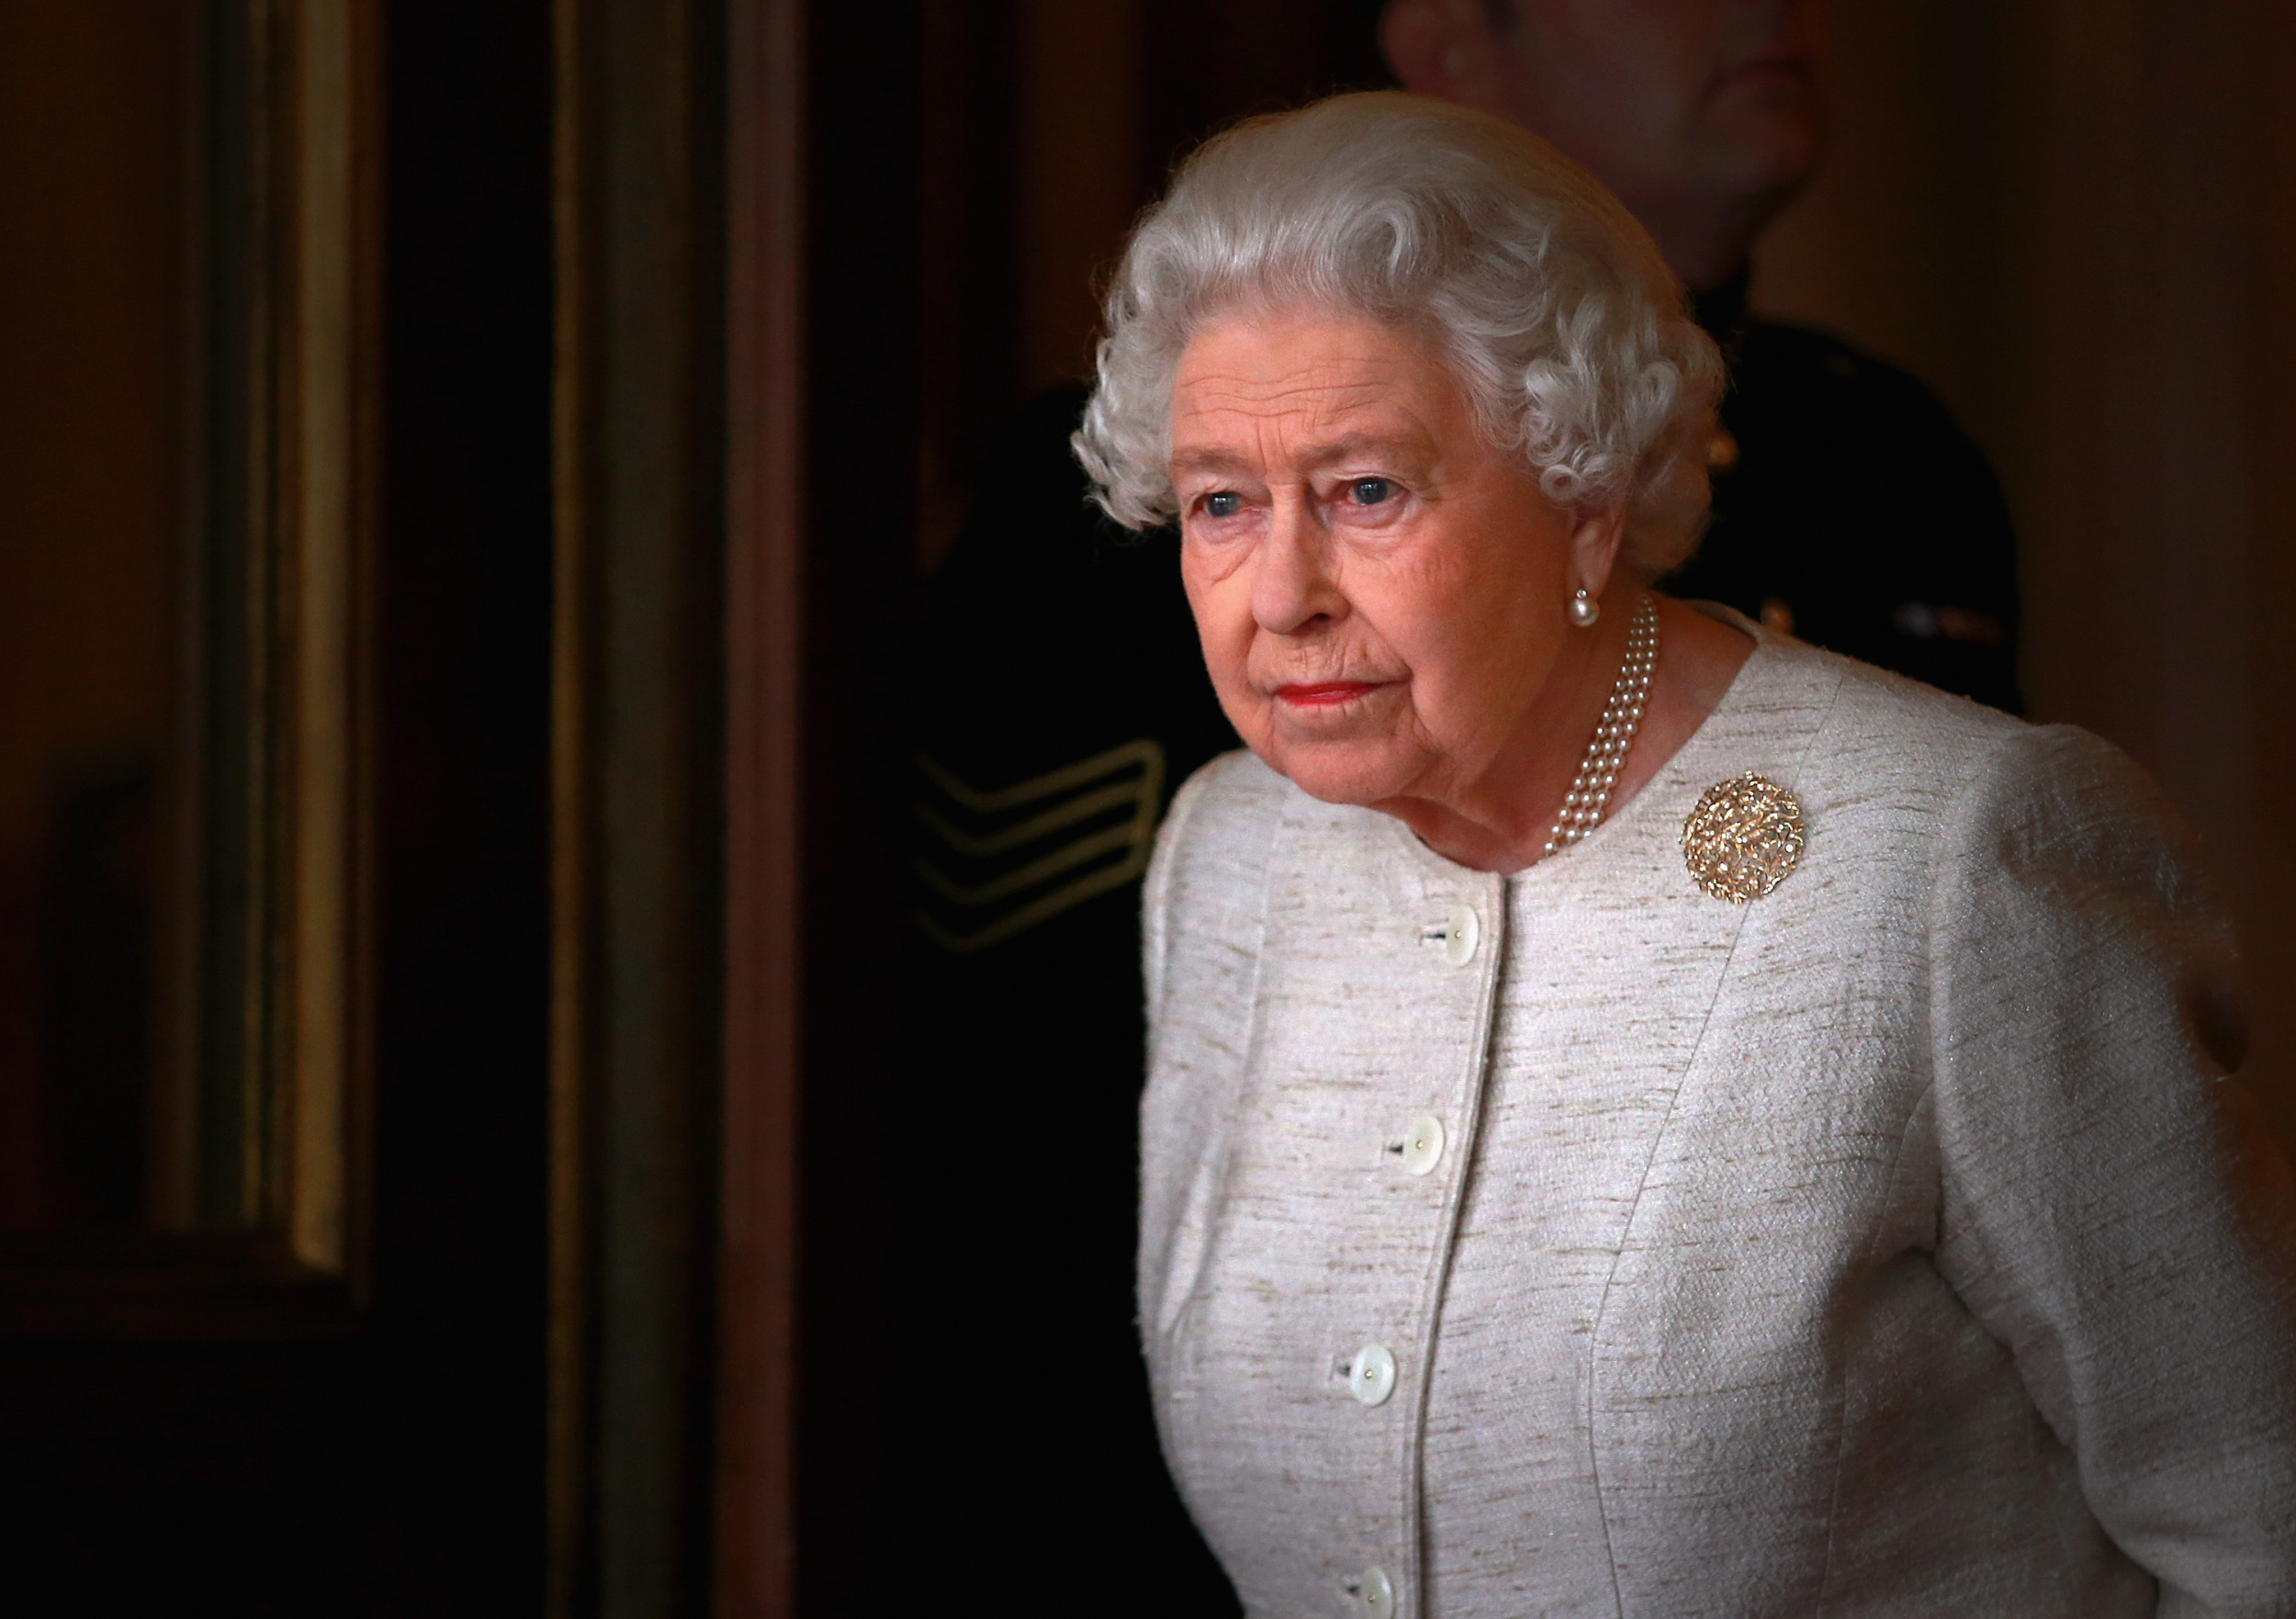 Queen Elizabeth's Former Royal Chef Darren McGrady Reveals Her Most Hated Food